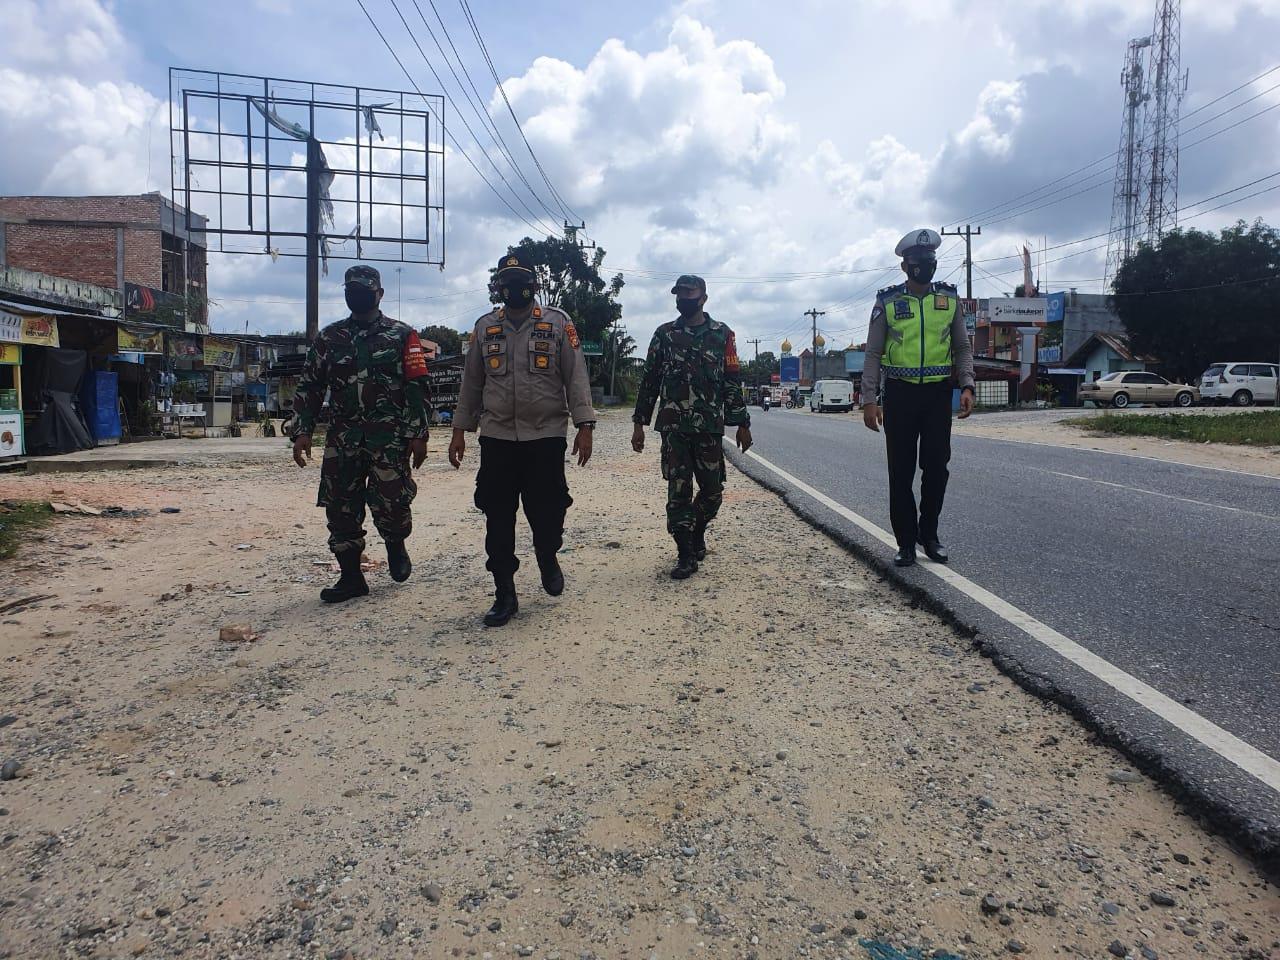 Bersama TNI, Polsek Bandar Sei Kijang Lakukan Patroli Kamtibmas